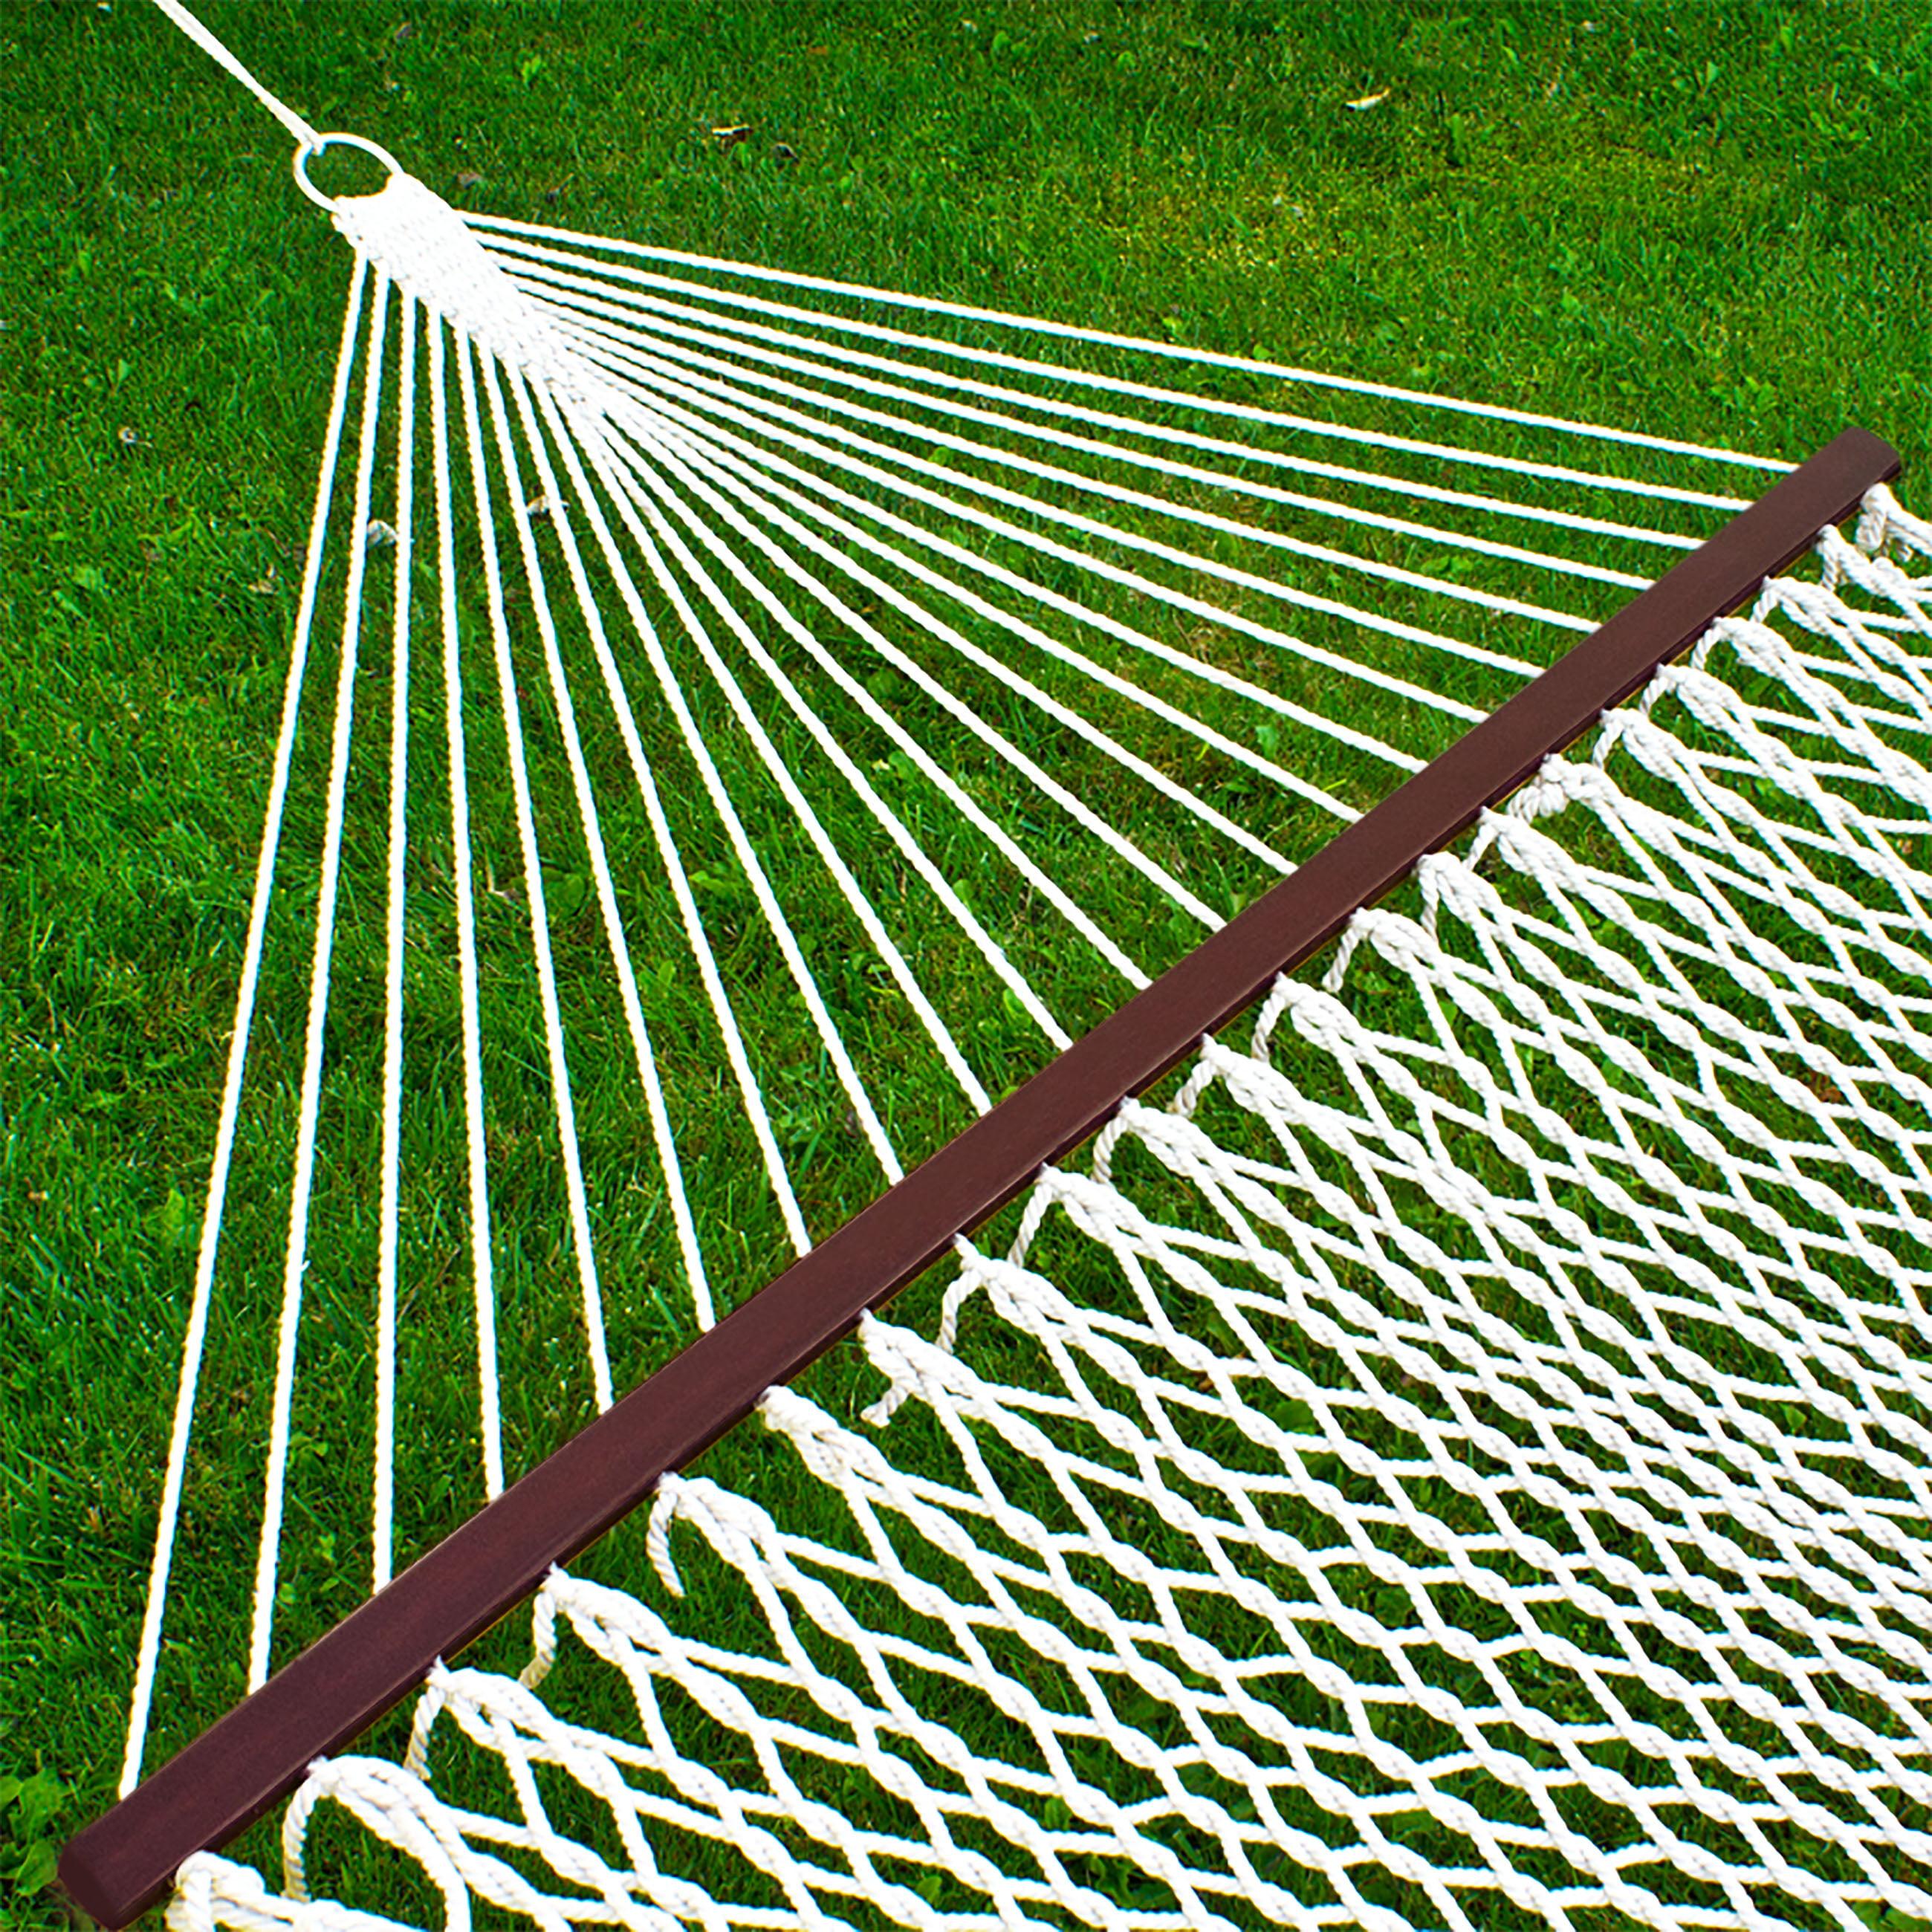 "Hammock 59"" Cotton Double Wide Solid Wood Spreader Outdoor Patio Yard Hammock by"